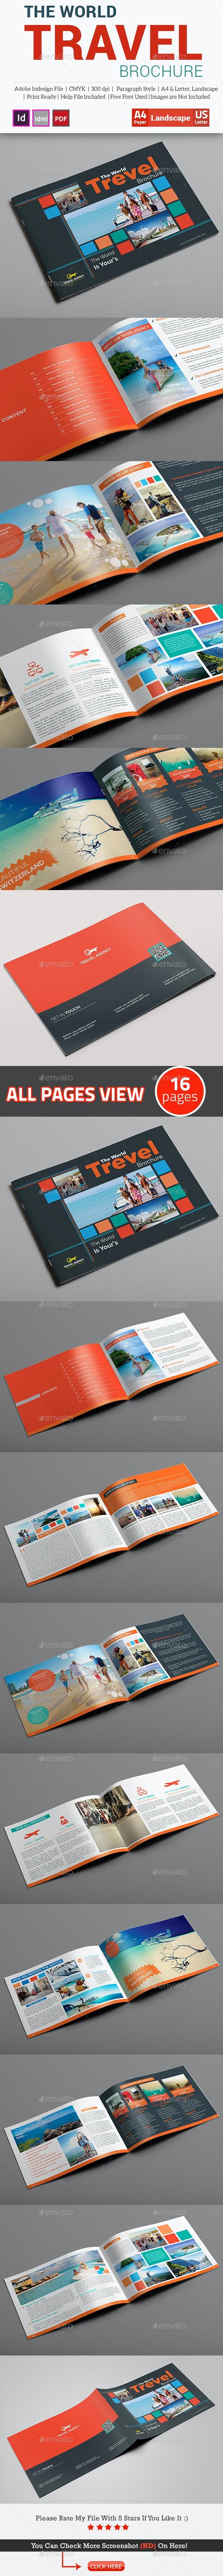 Travel Agency Brochure Or Catalog Template - Brochures Print Templates